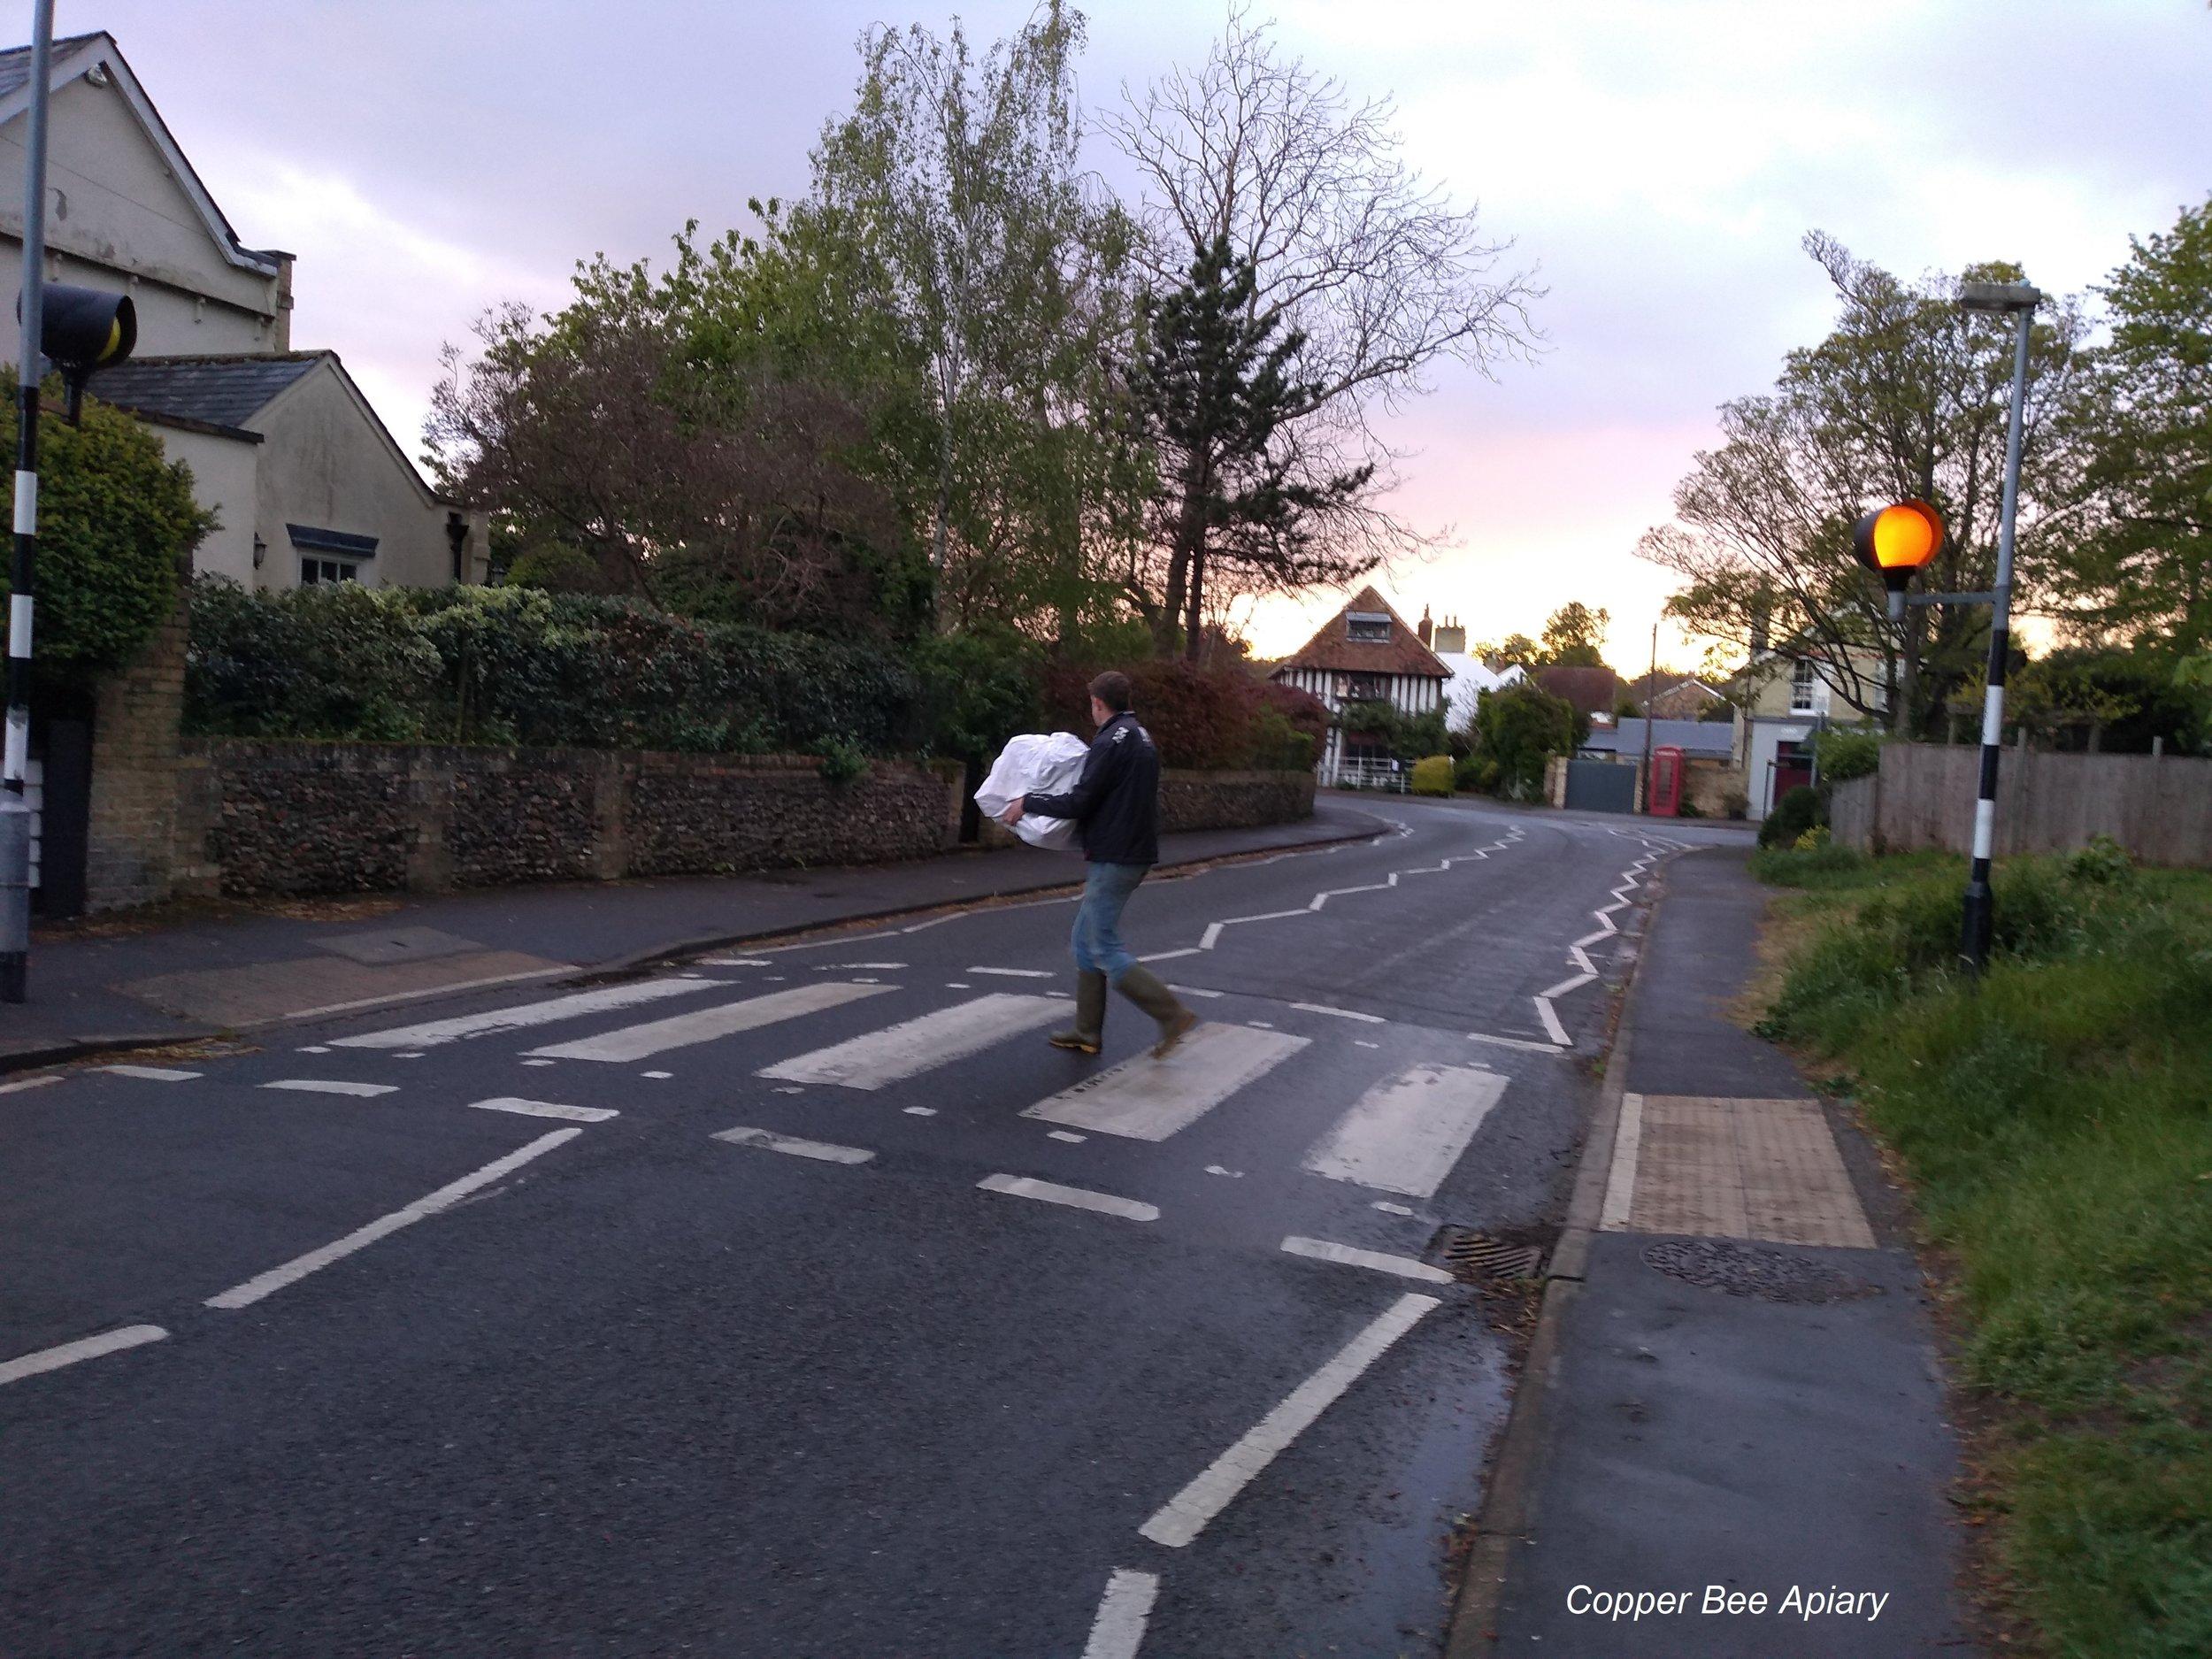 Bees crossing